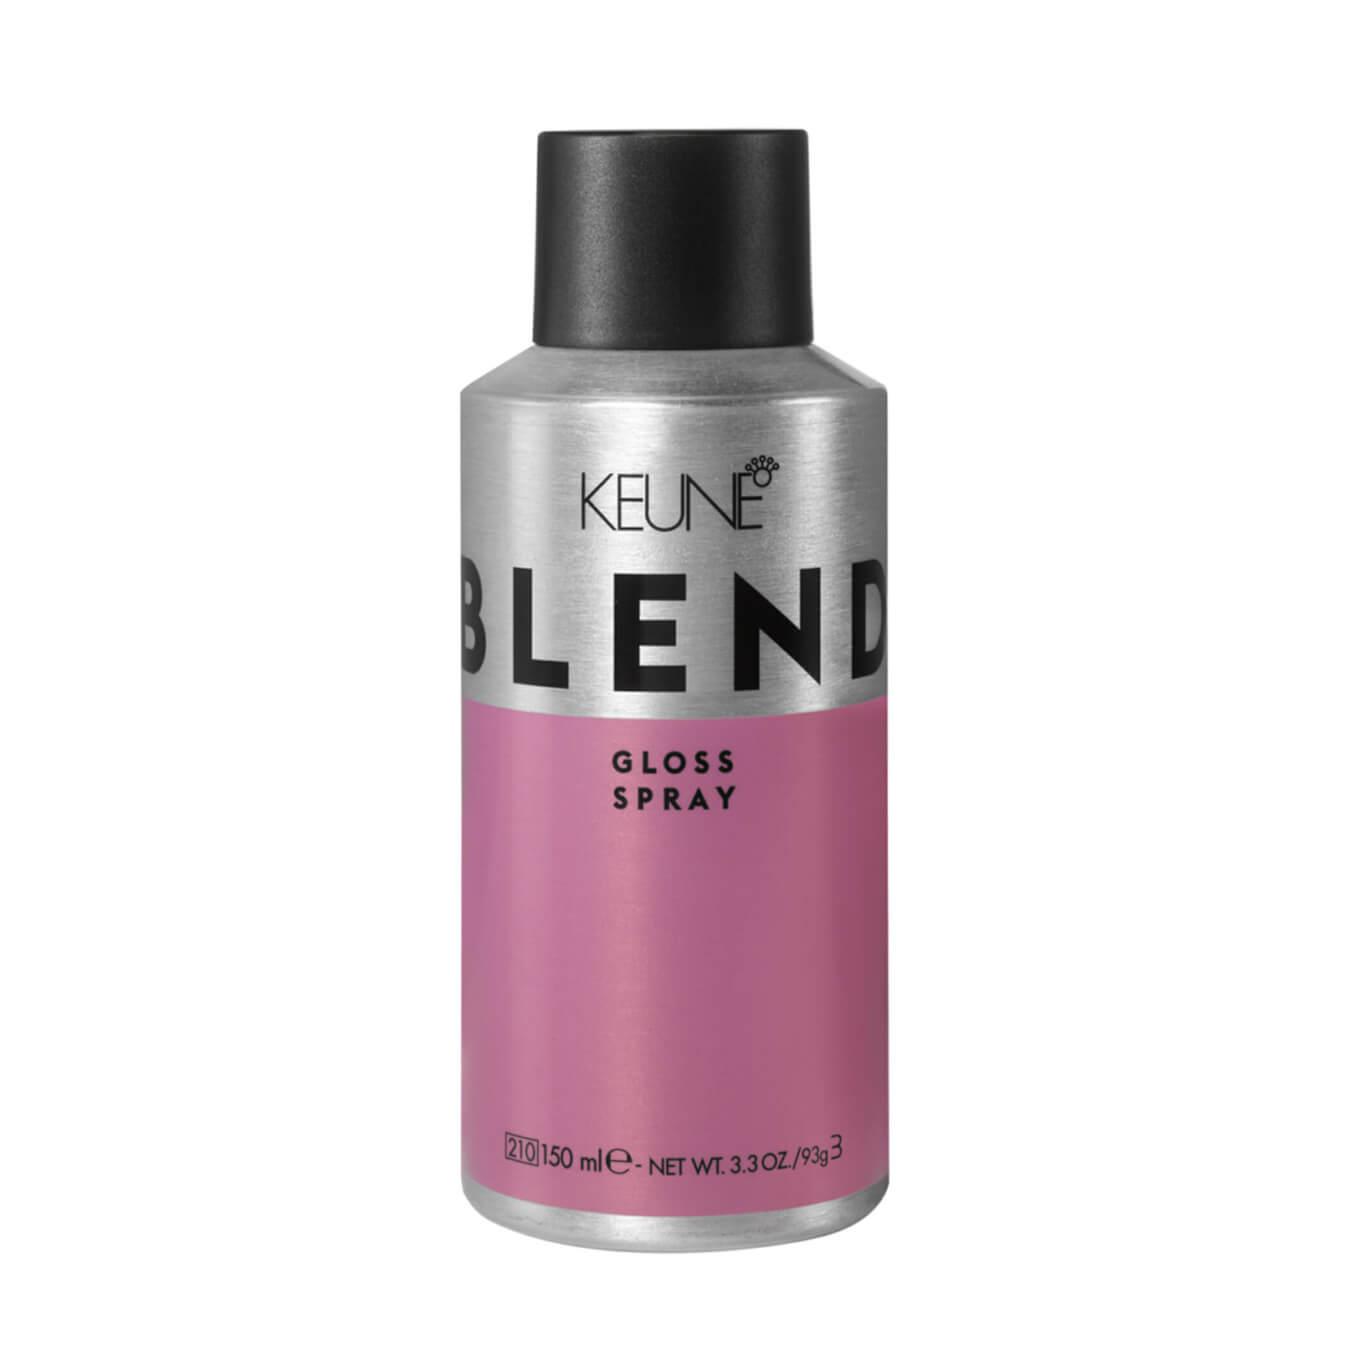 Kauf Keune Blend Gloss Spray 150ml